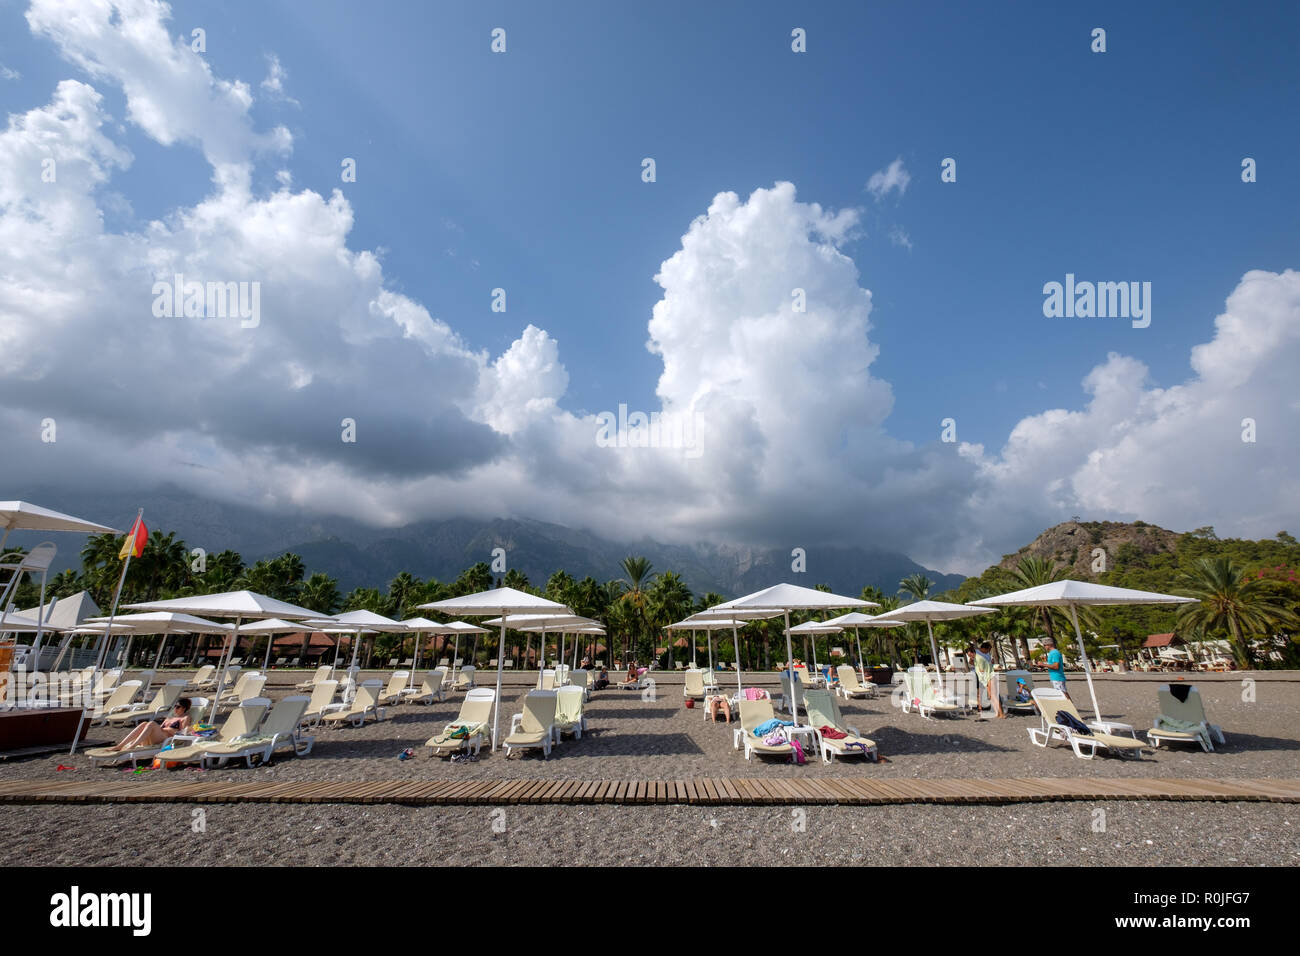 Deckchairs and beach umbrellas at the Club Med Palmiye luxury all inclusive resort, Kemer, Antalya, Turkey - Stock Image